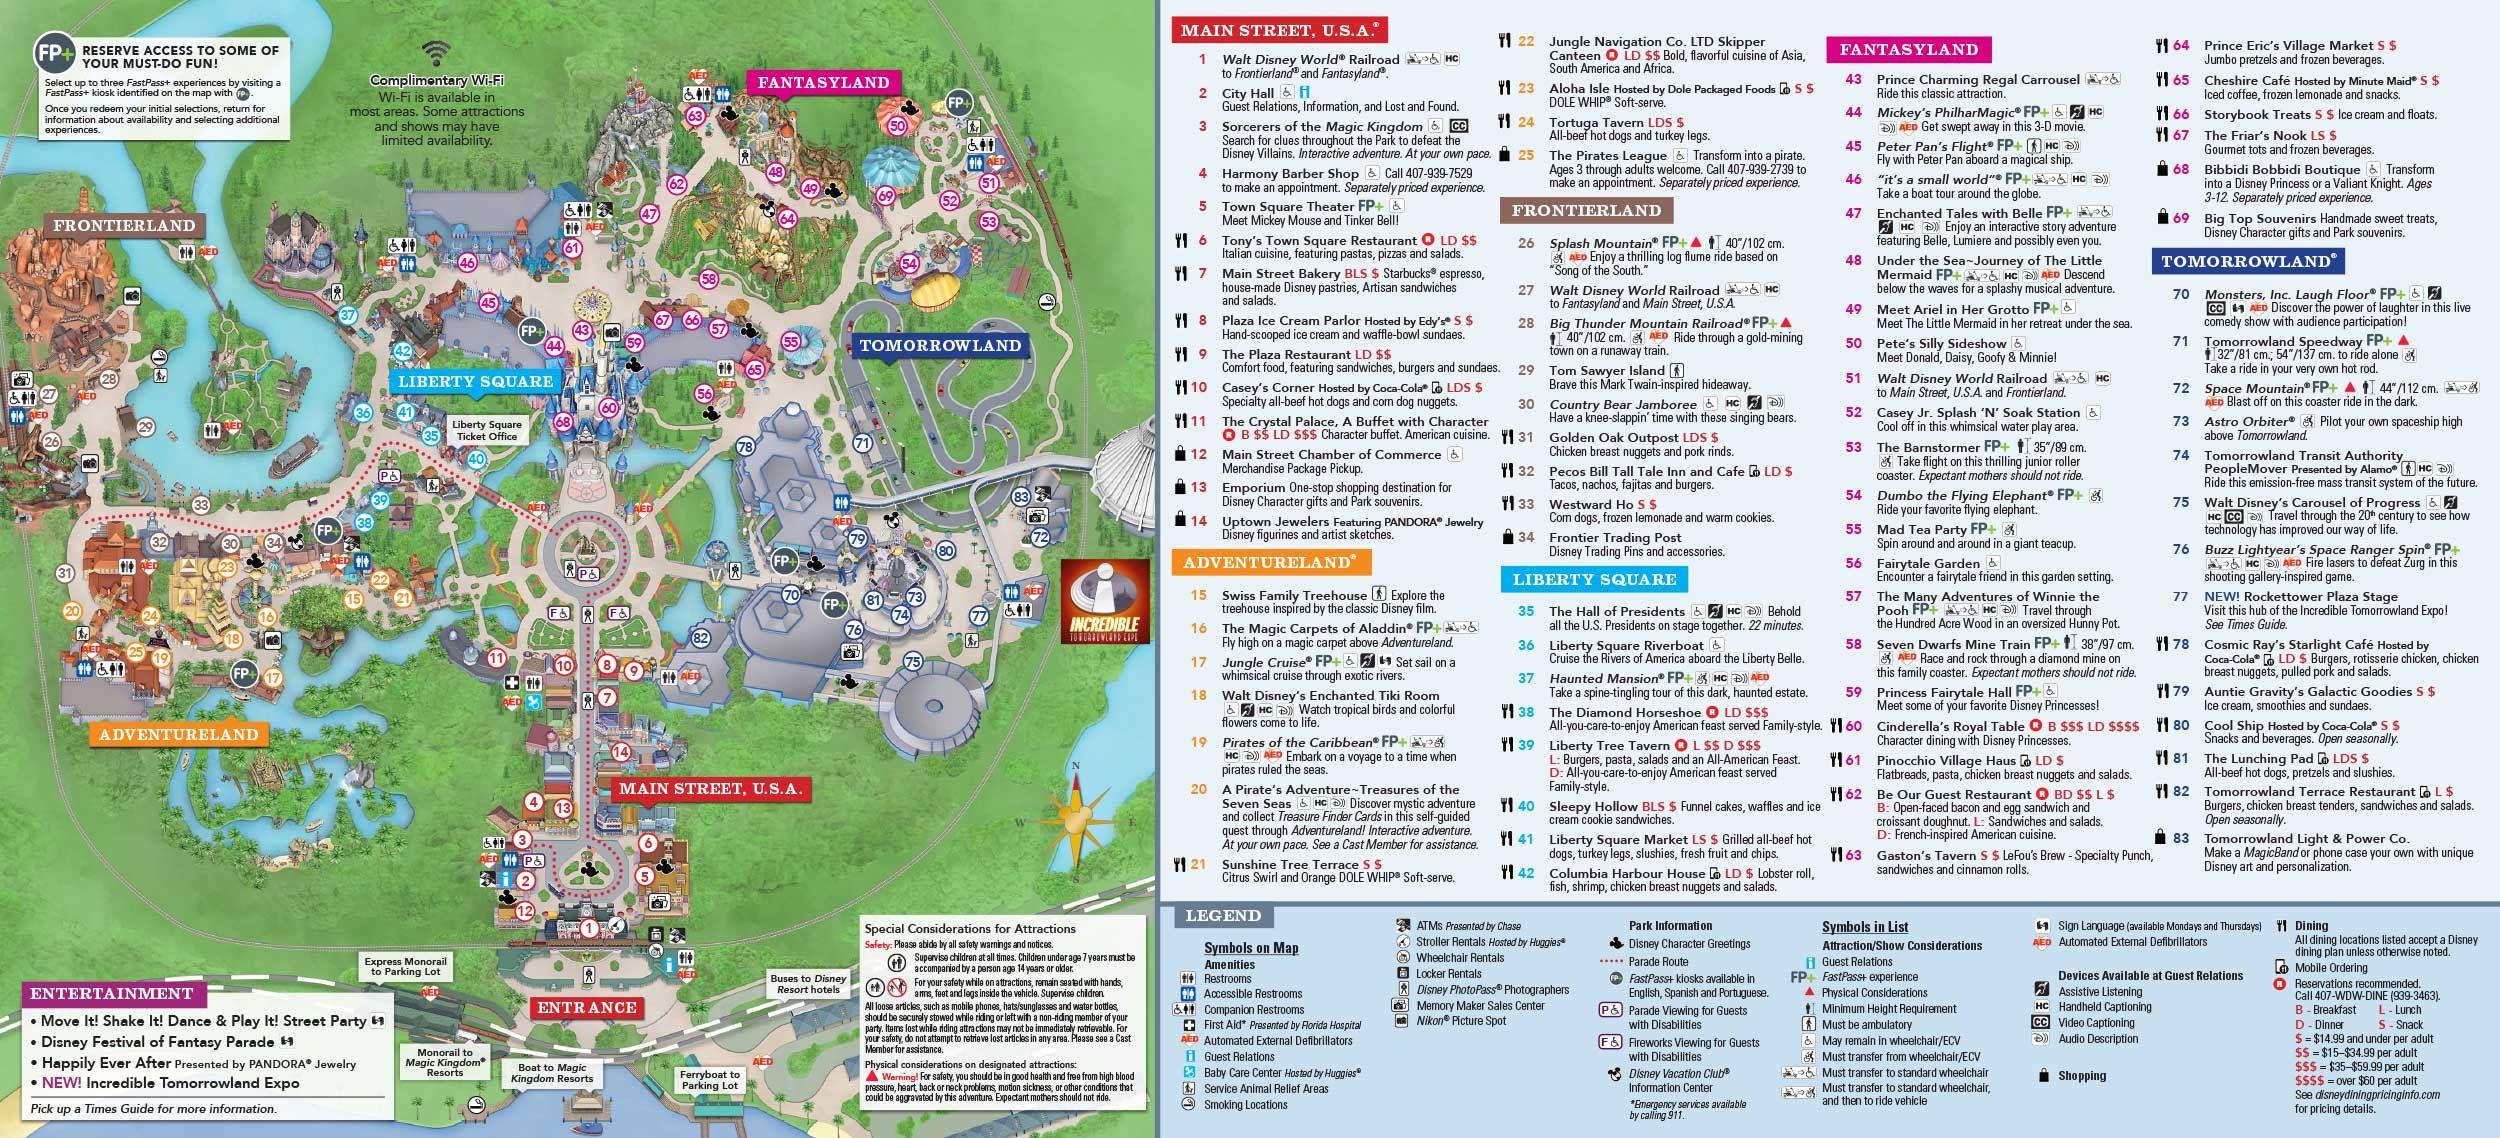 Magic Kingdom Park Map | Disney In 2019 | Pinterest | Disney World - Map Of Magic Kingdom Orlando Florida